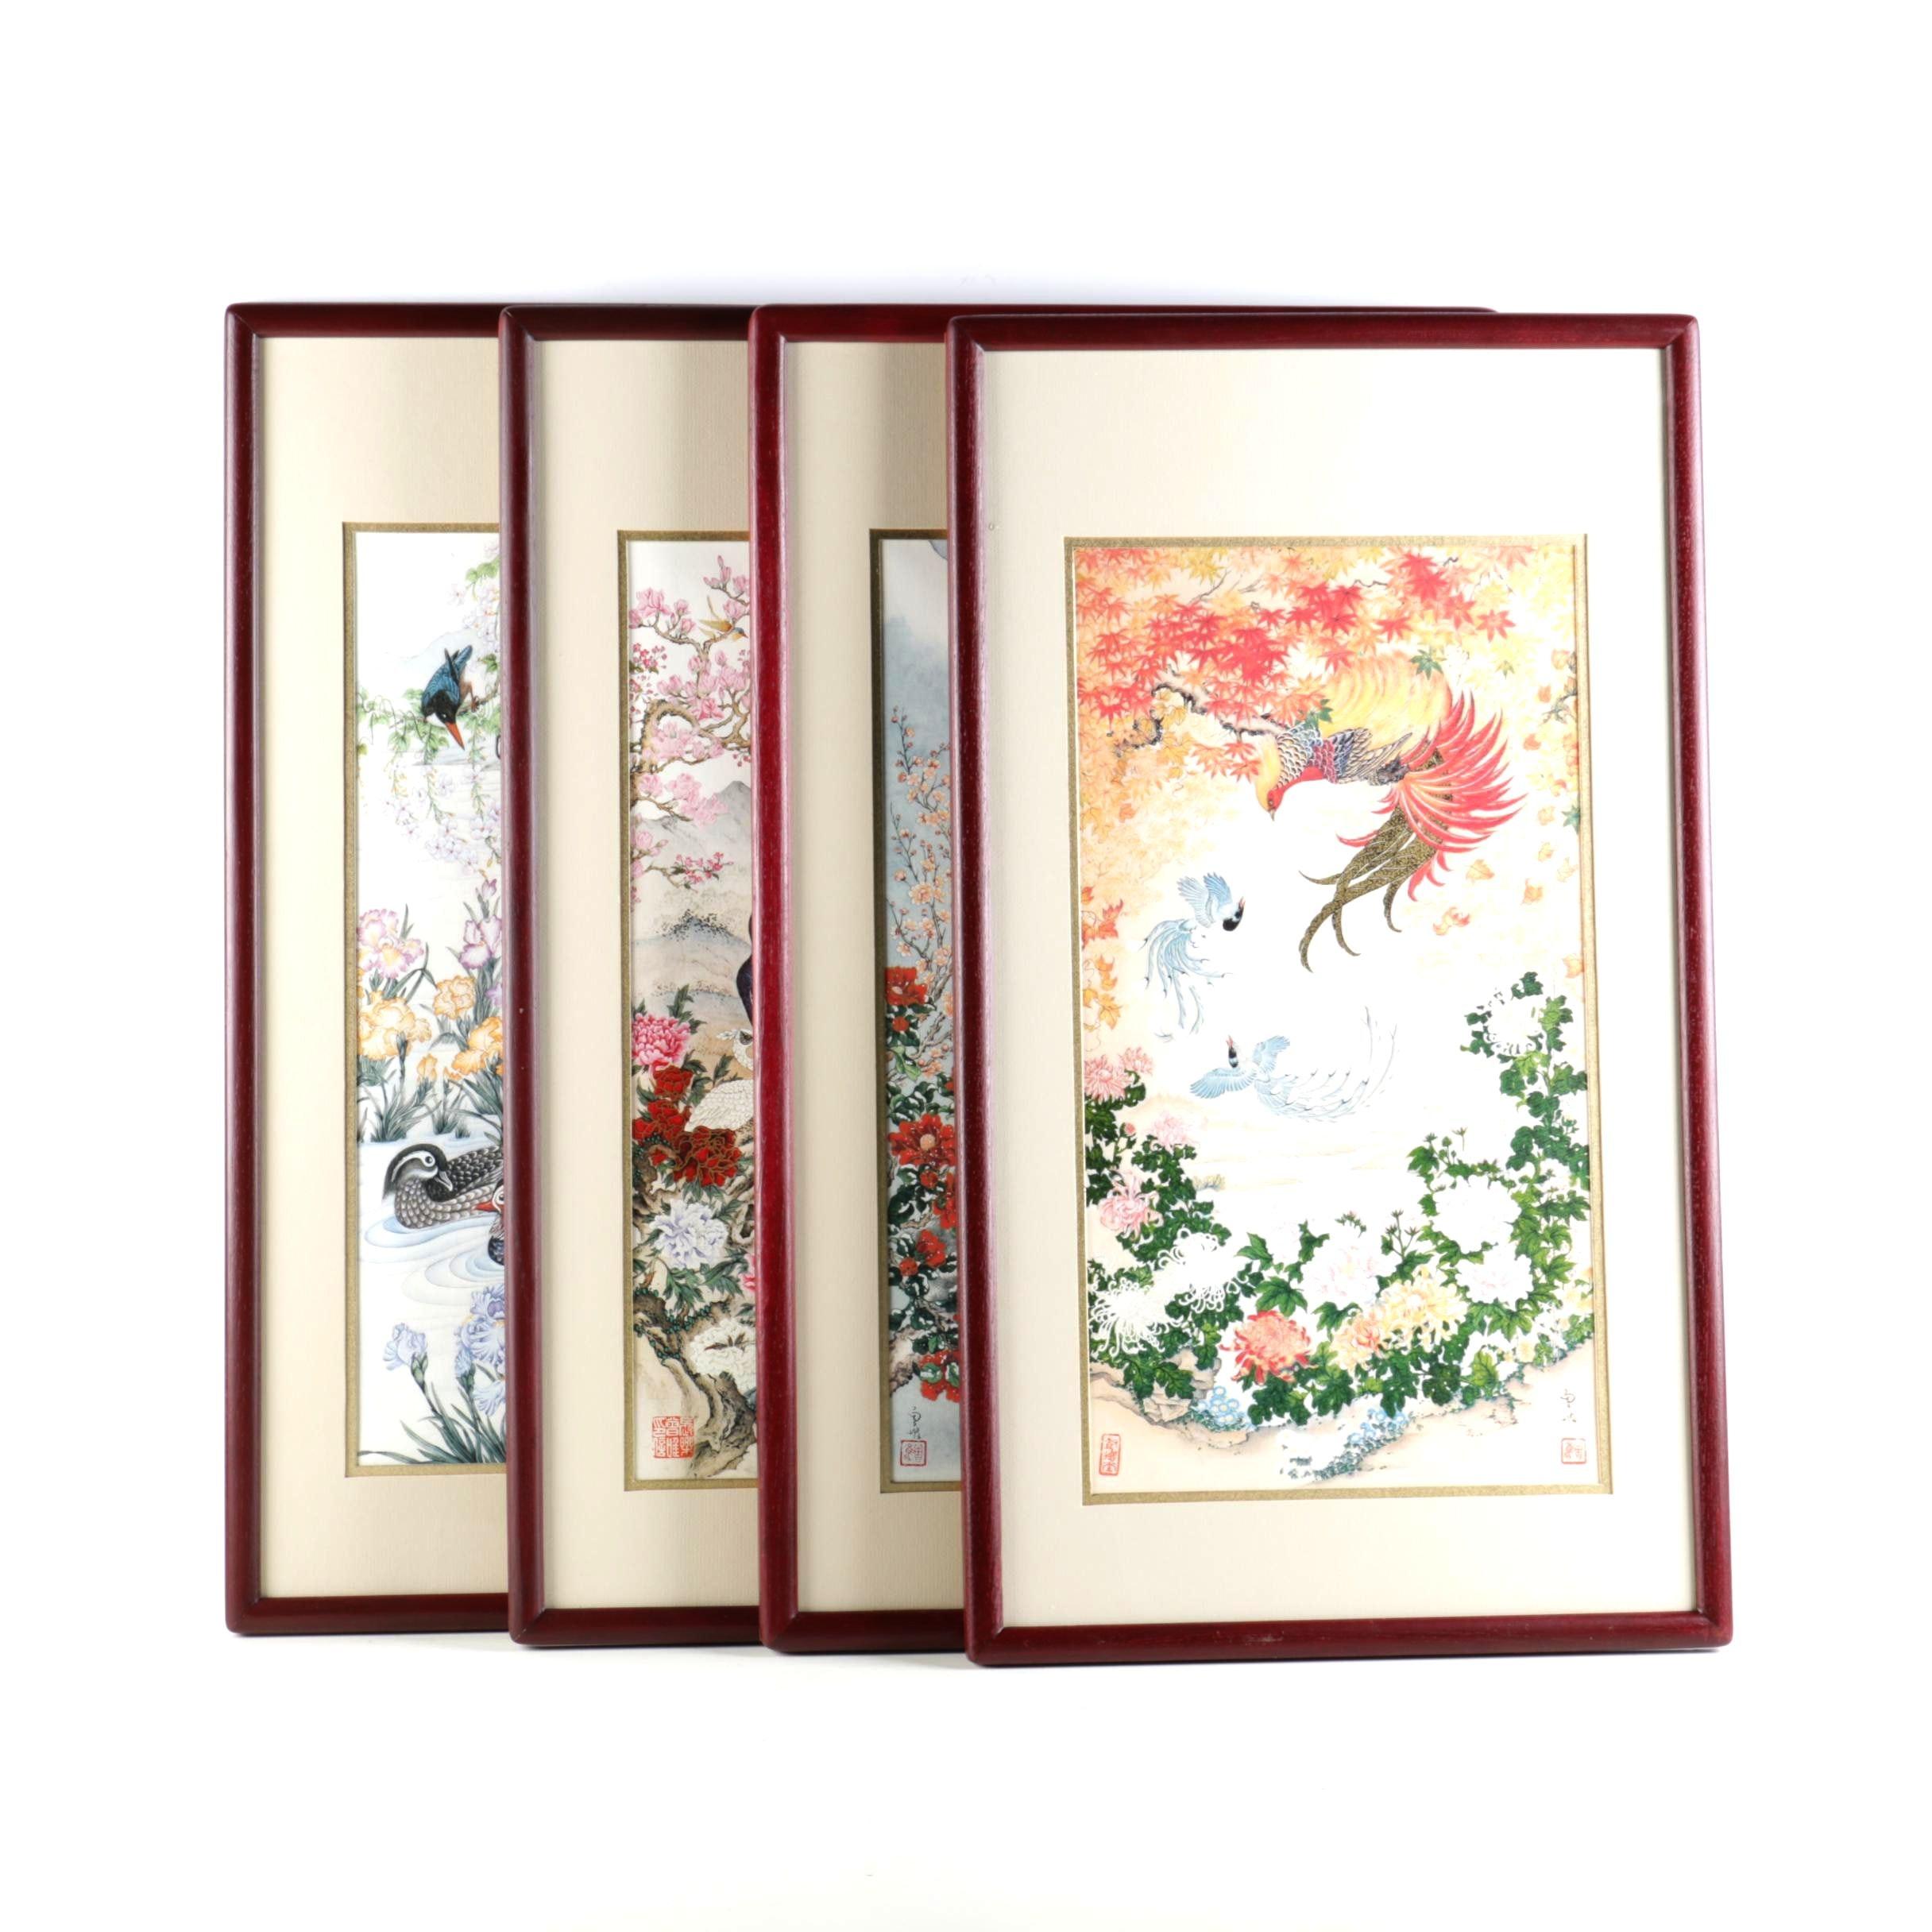 Wei Tseng Yang Offset Lithograph Series on Silk